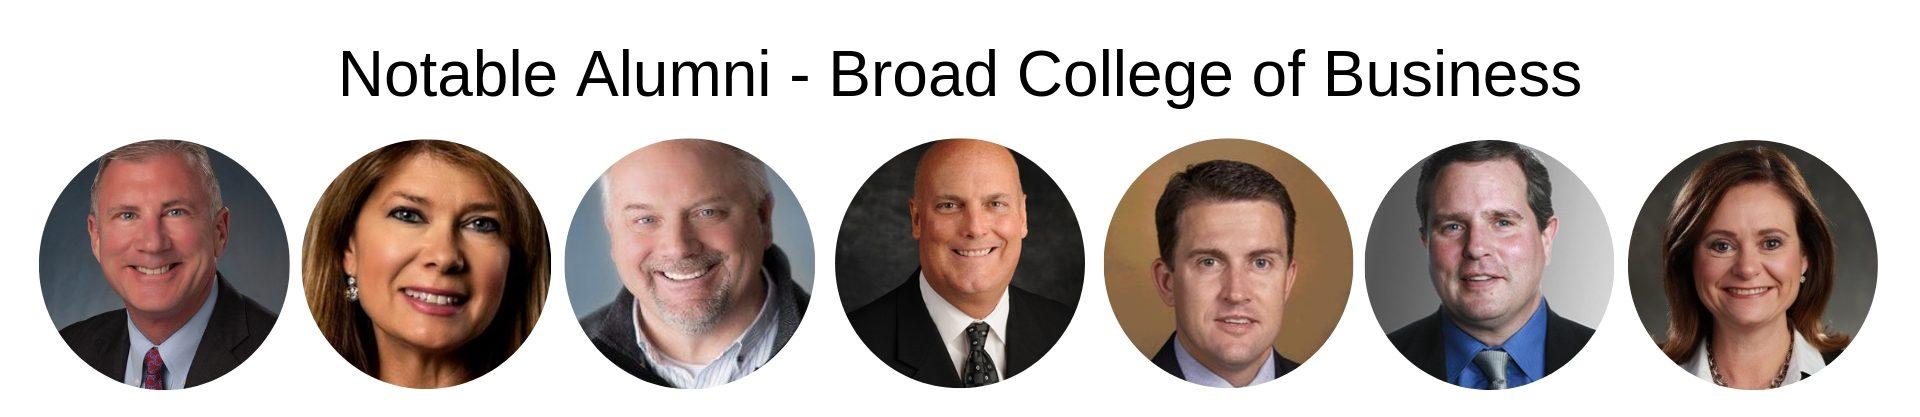 MSU MBA - Eli Broad College of Business - MSU MBA - Notable Alumni